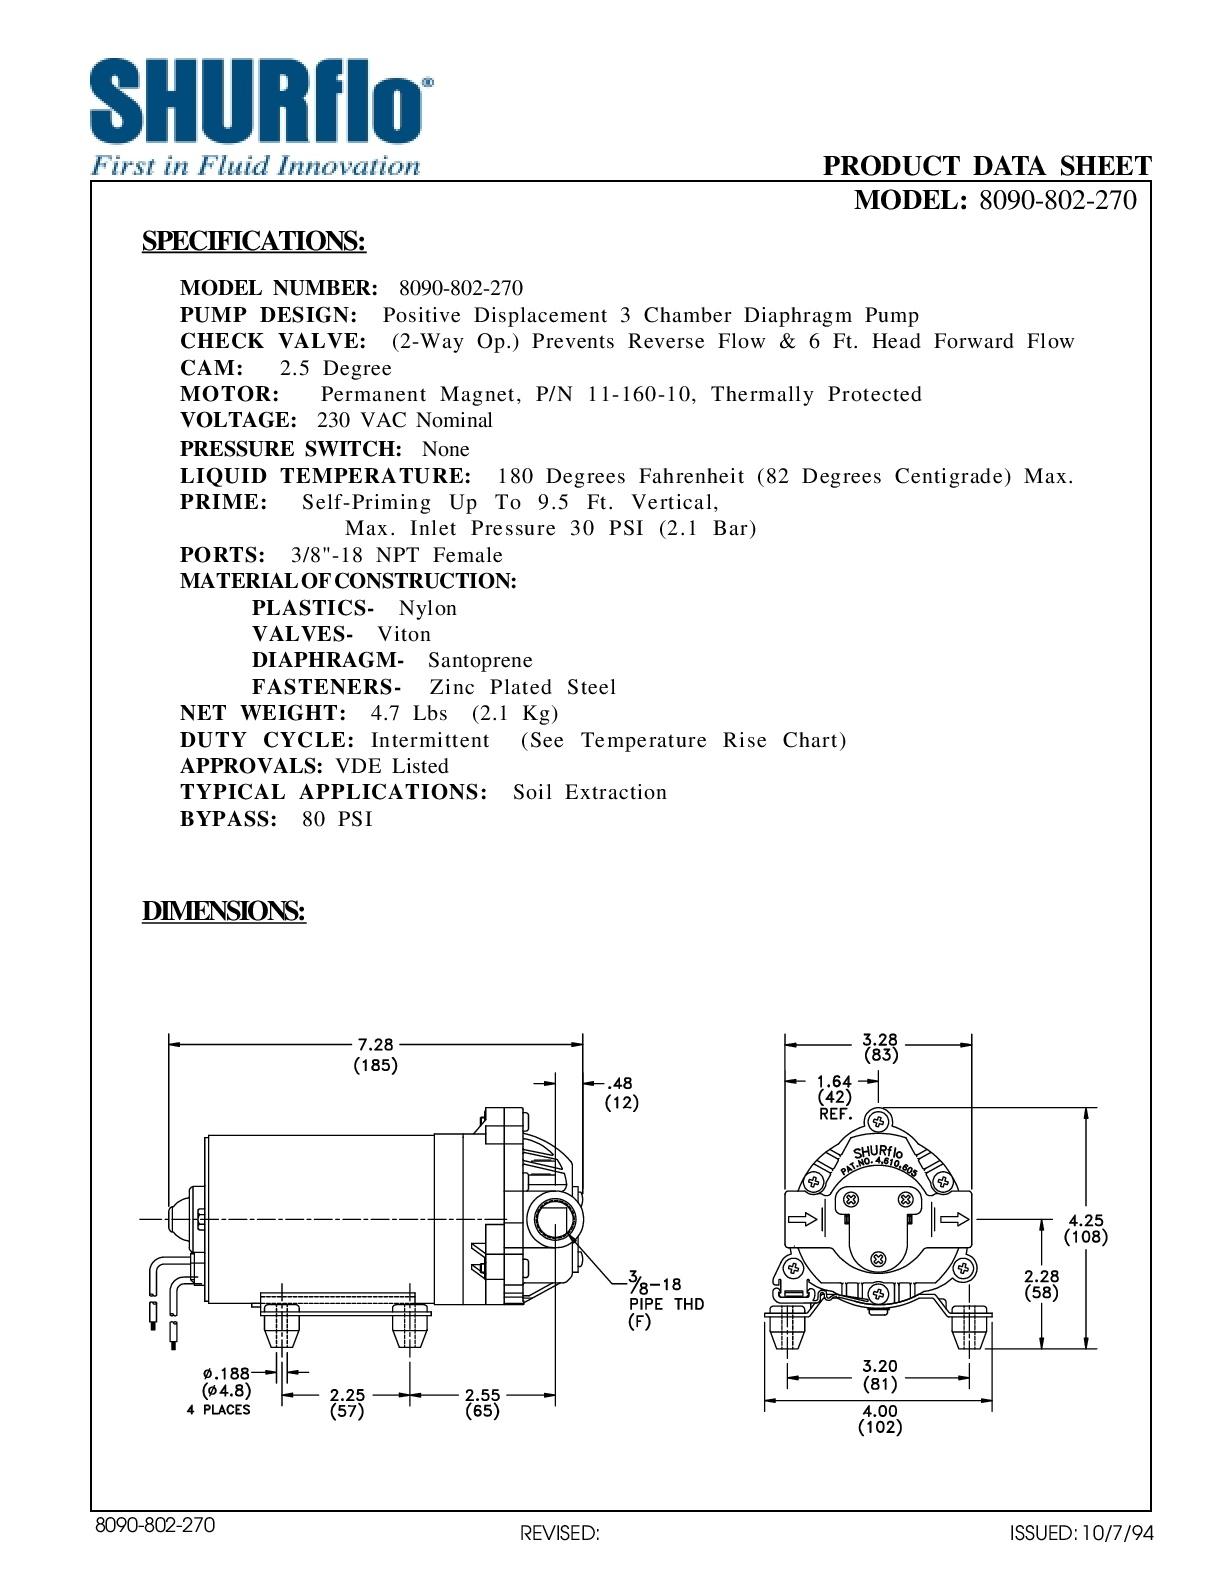 pds-8090-802-270-001